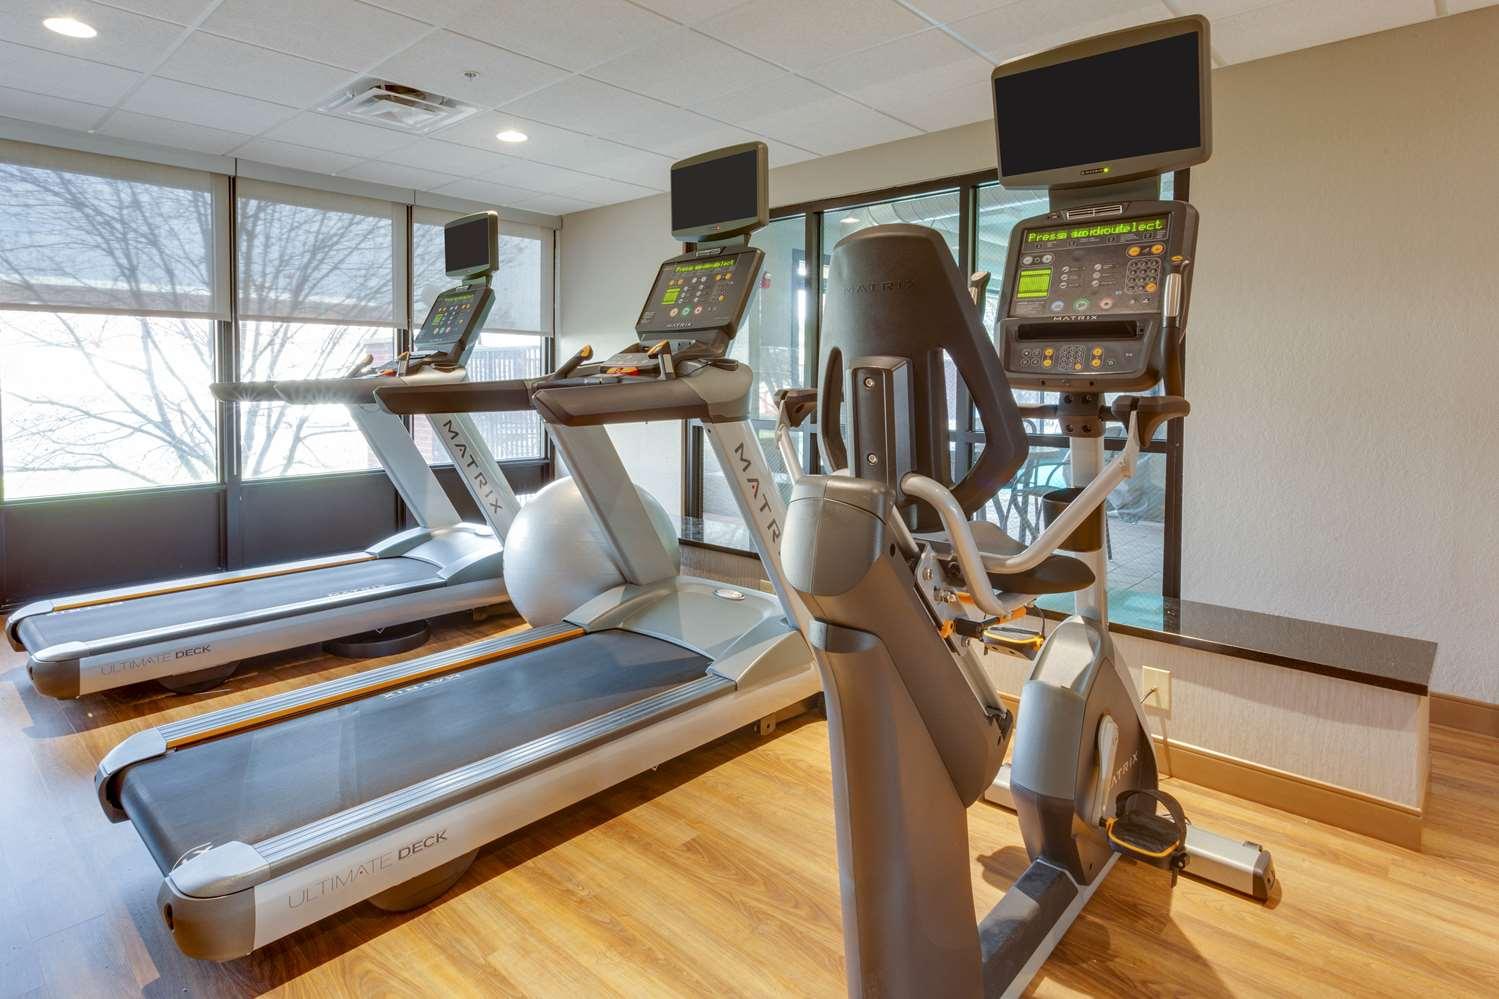 Fitness/ Exercise Room - Drury Inn & Suites Overland Park